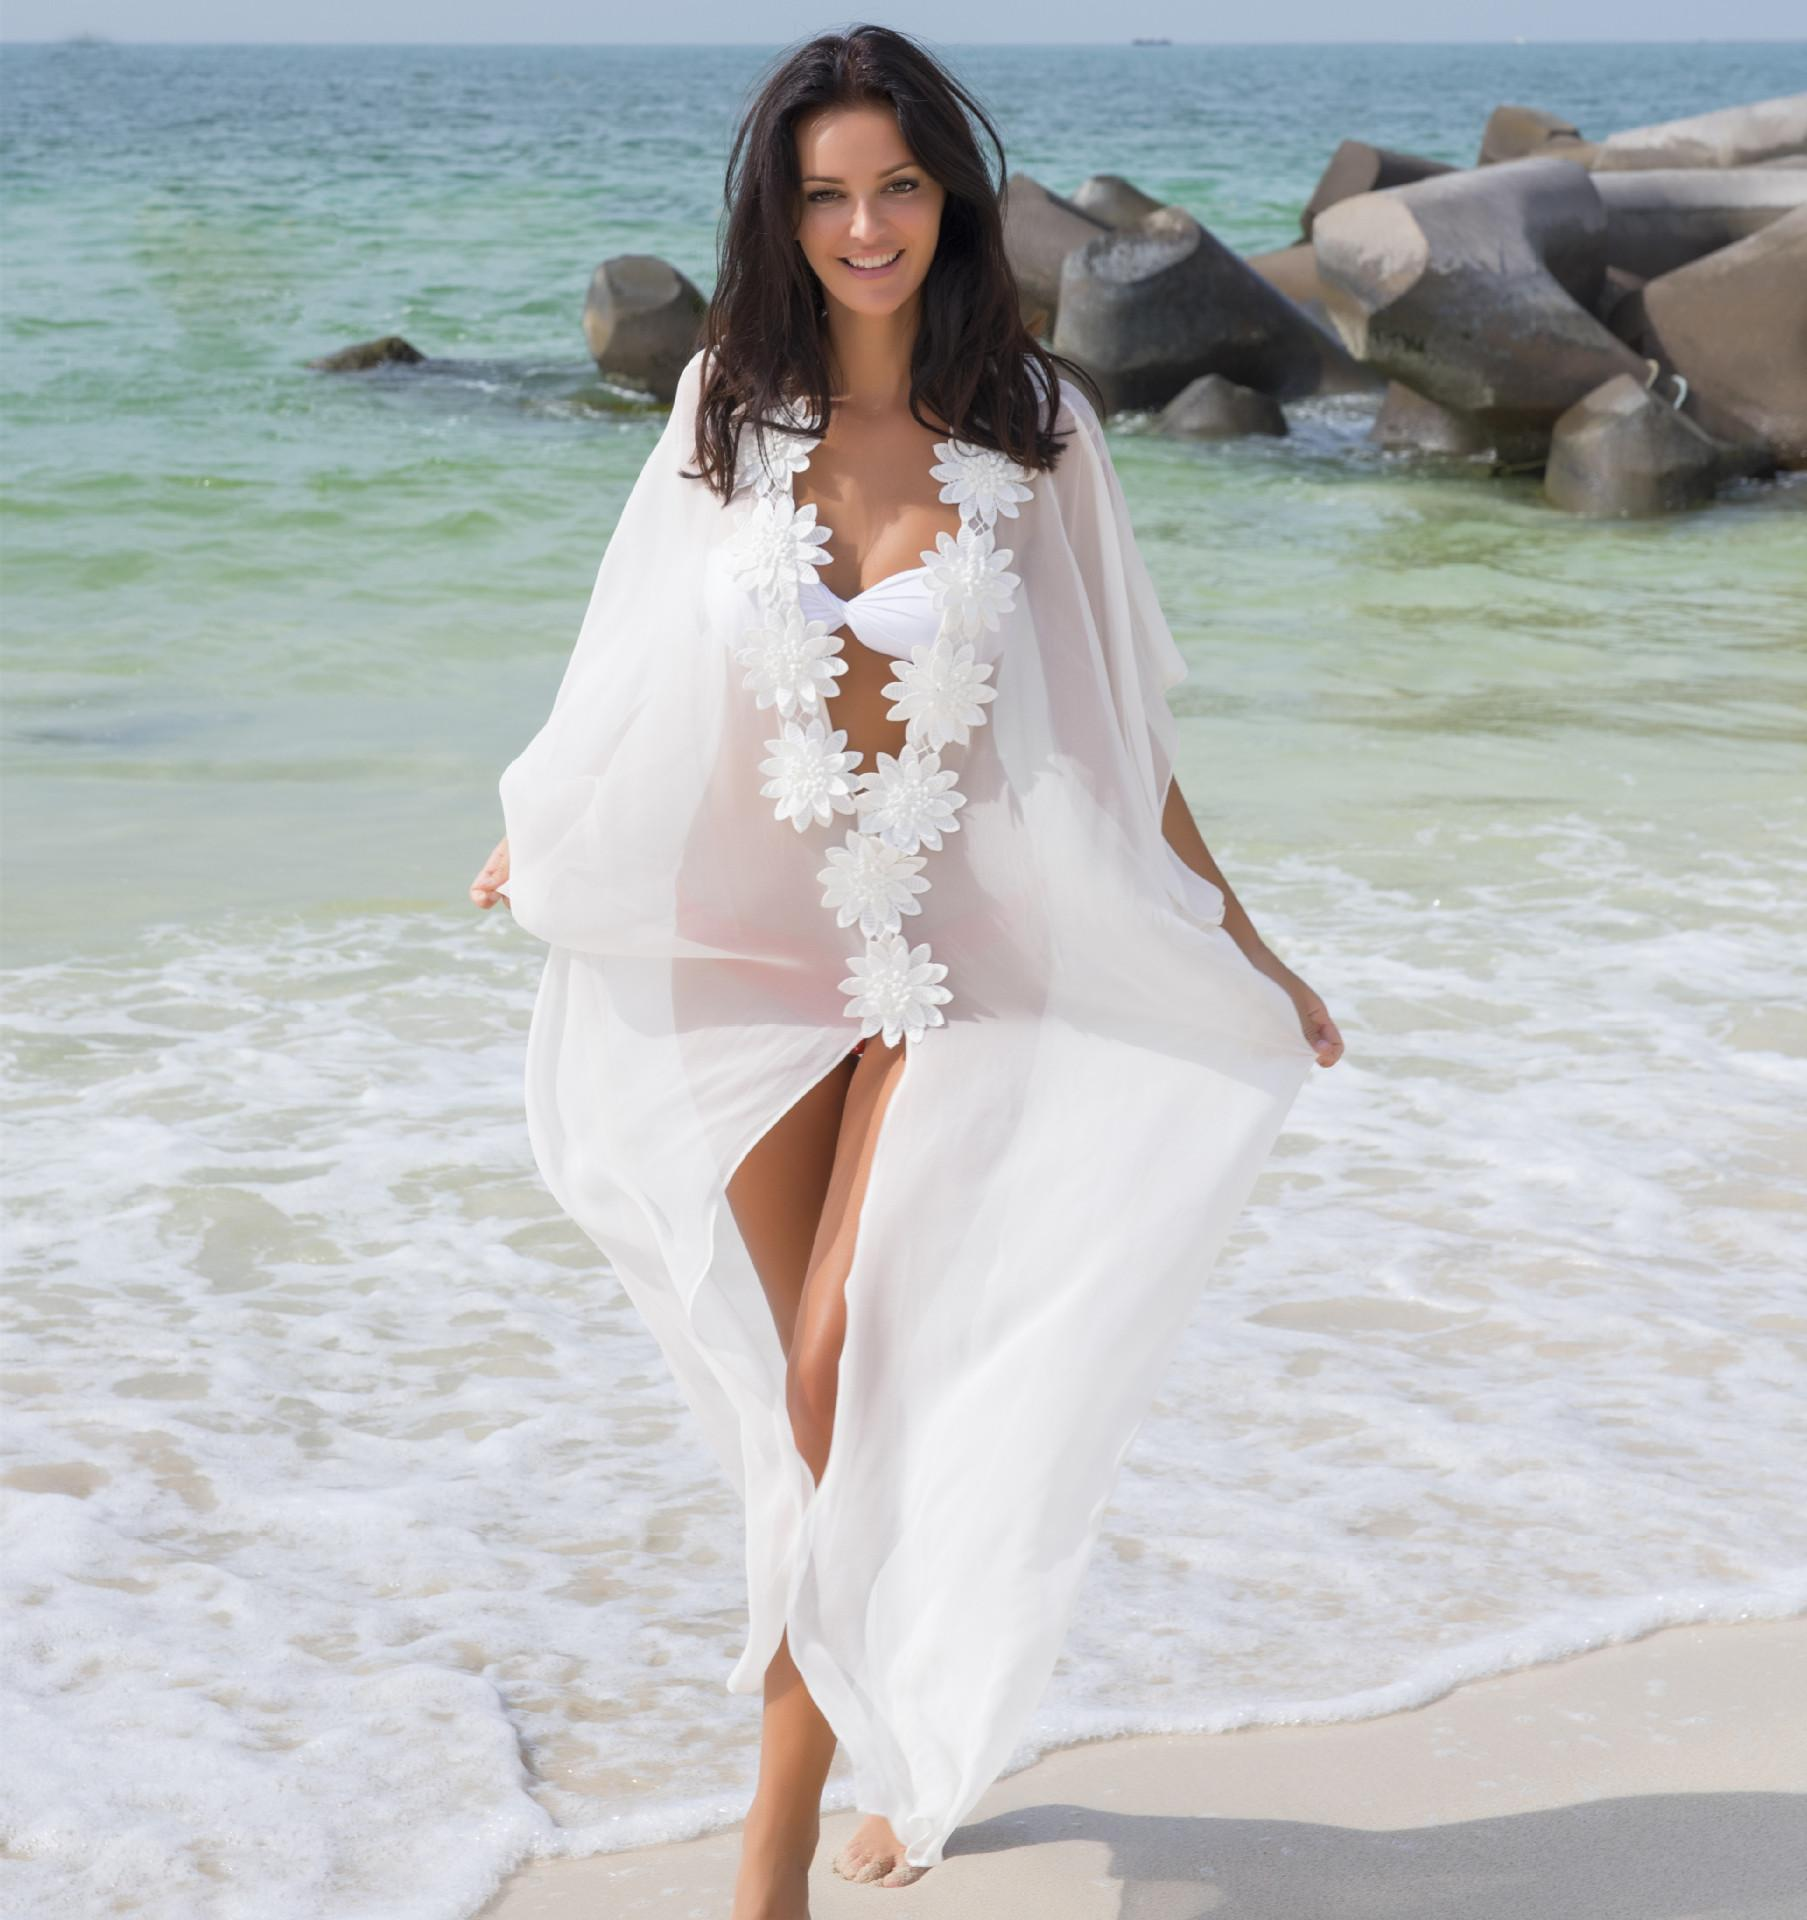 Summer Women Bikini Cover Up chiffon gauze Sun protection Beach sleeved sex bikini Bathing Suit coverups